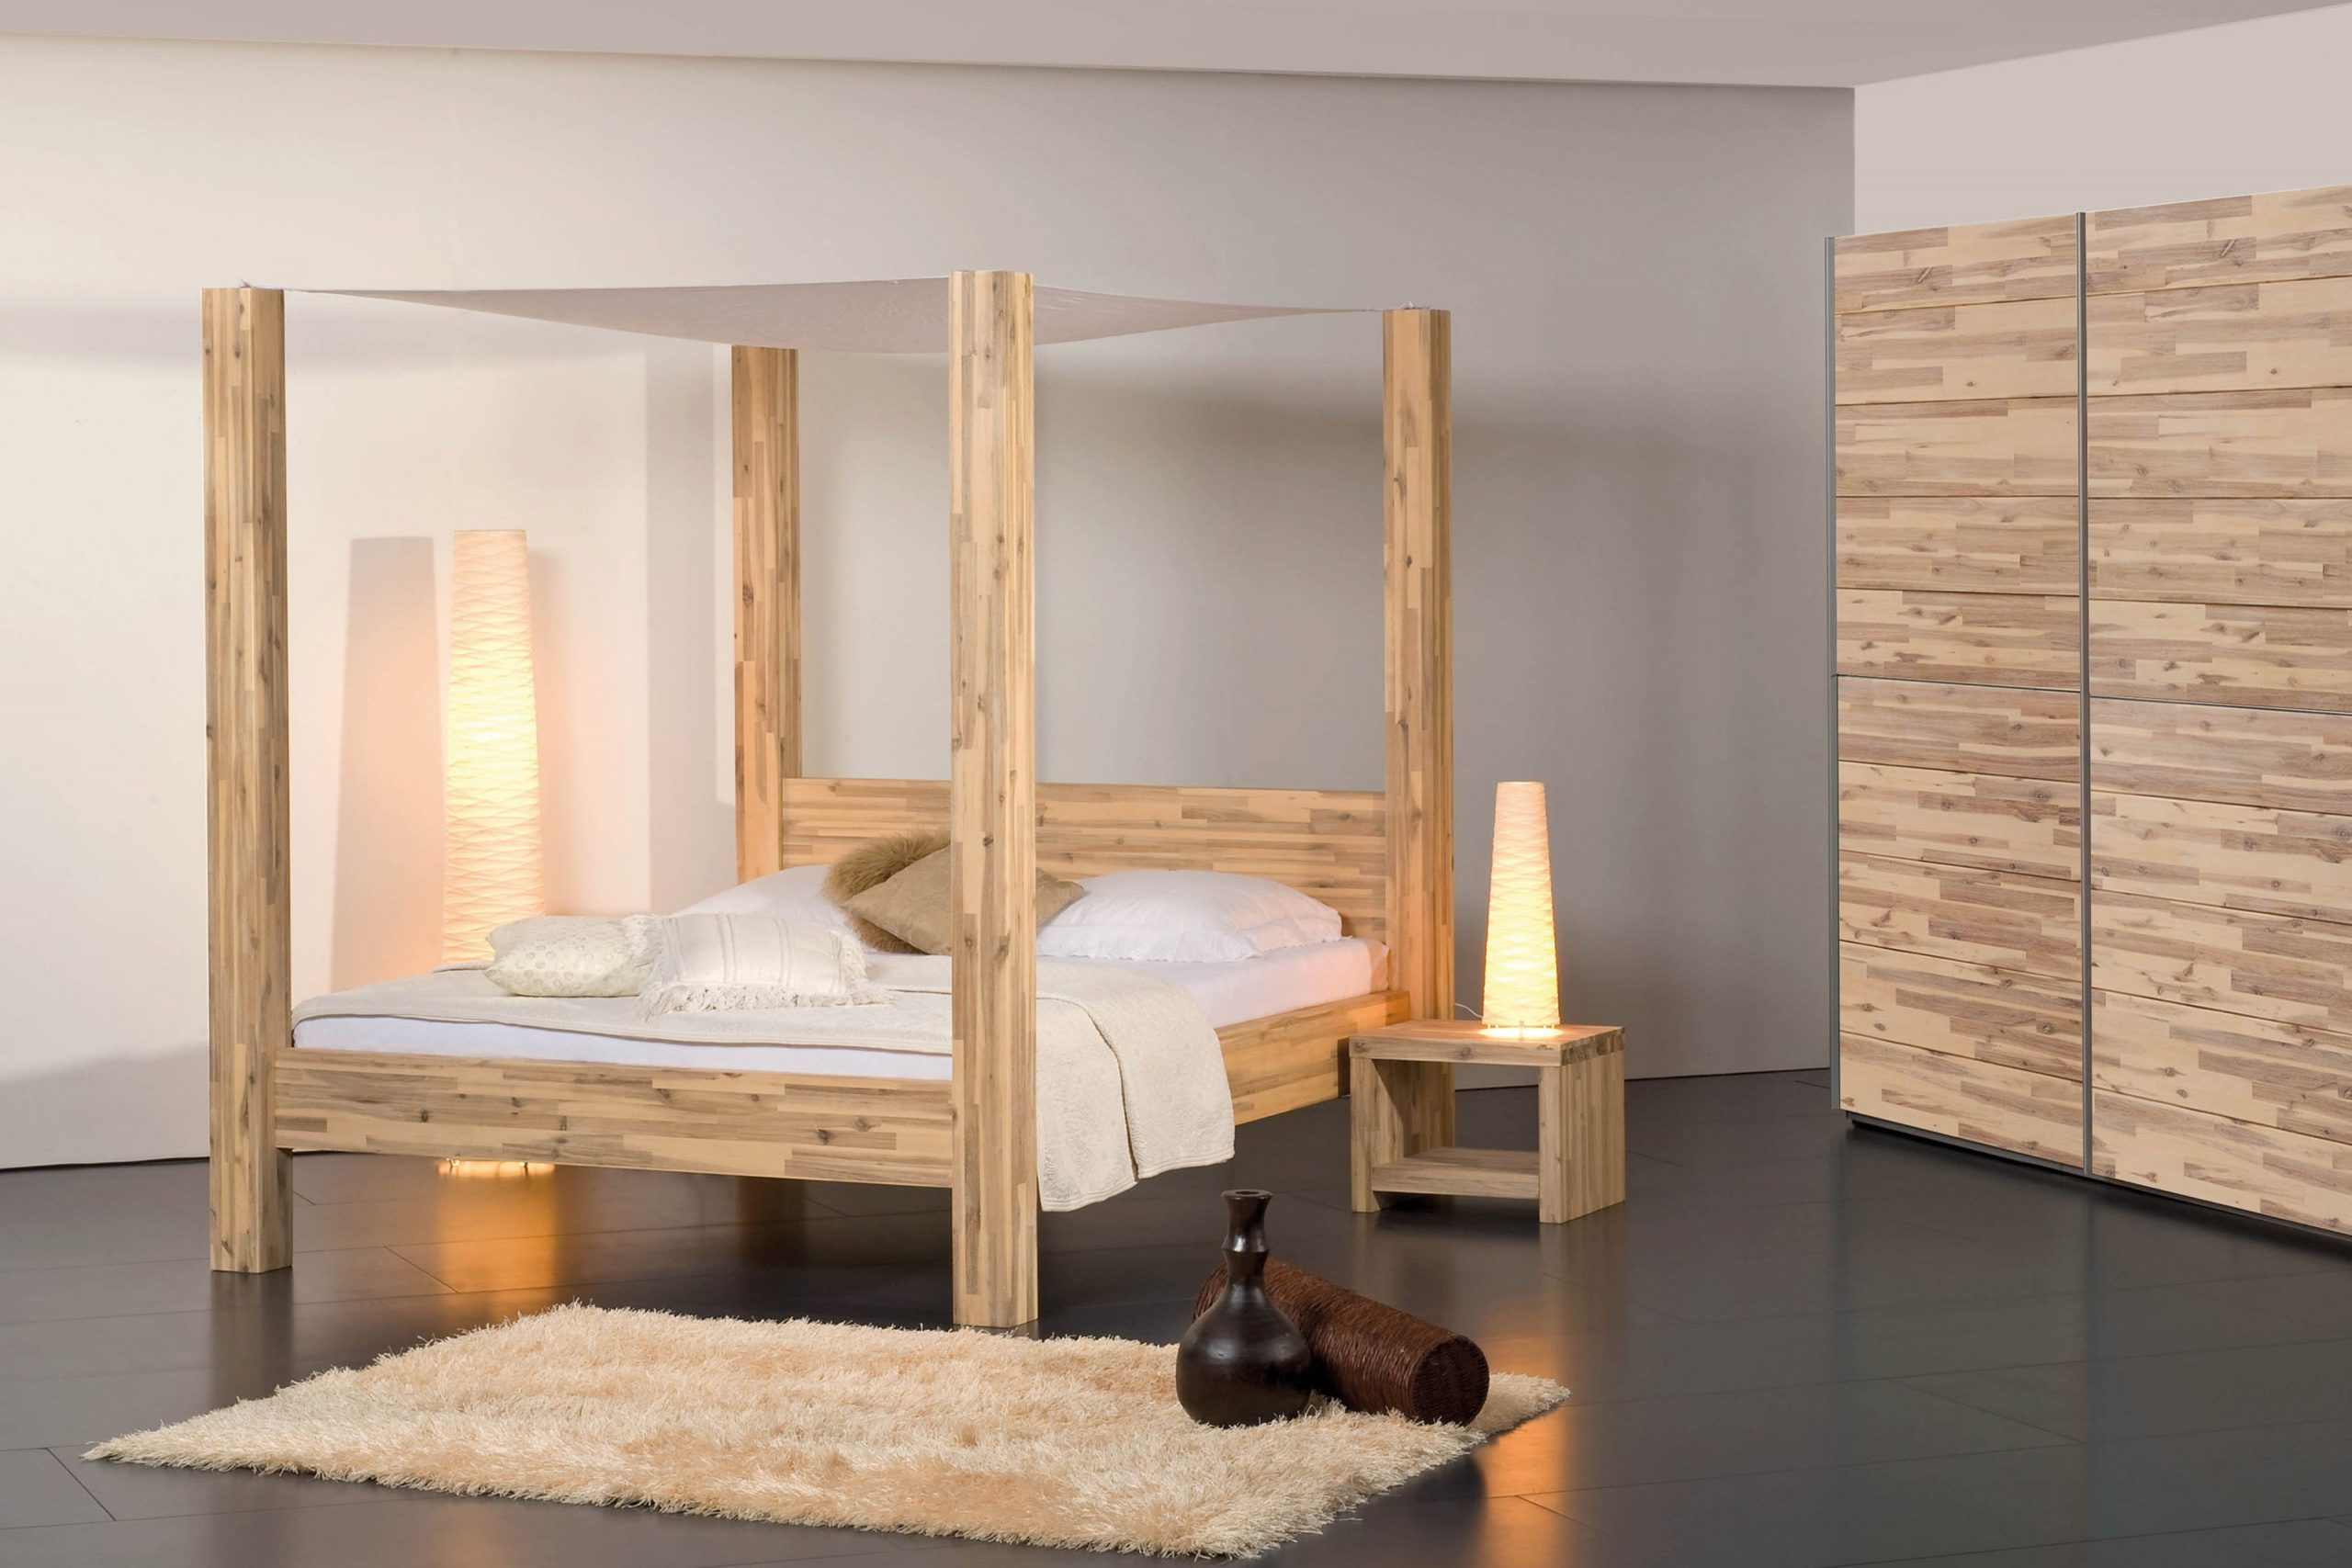 Full Size of Tojo V Bett Idealo Microspot Vikas Ltd New Delhi Bett  Matratzen Bed Review Sushi Vancouver Menu Tripadvisor Vs Oga Gestell Video Death Wohnzimmer Tojo V